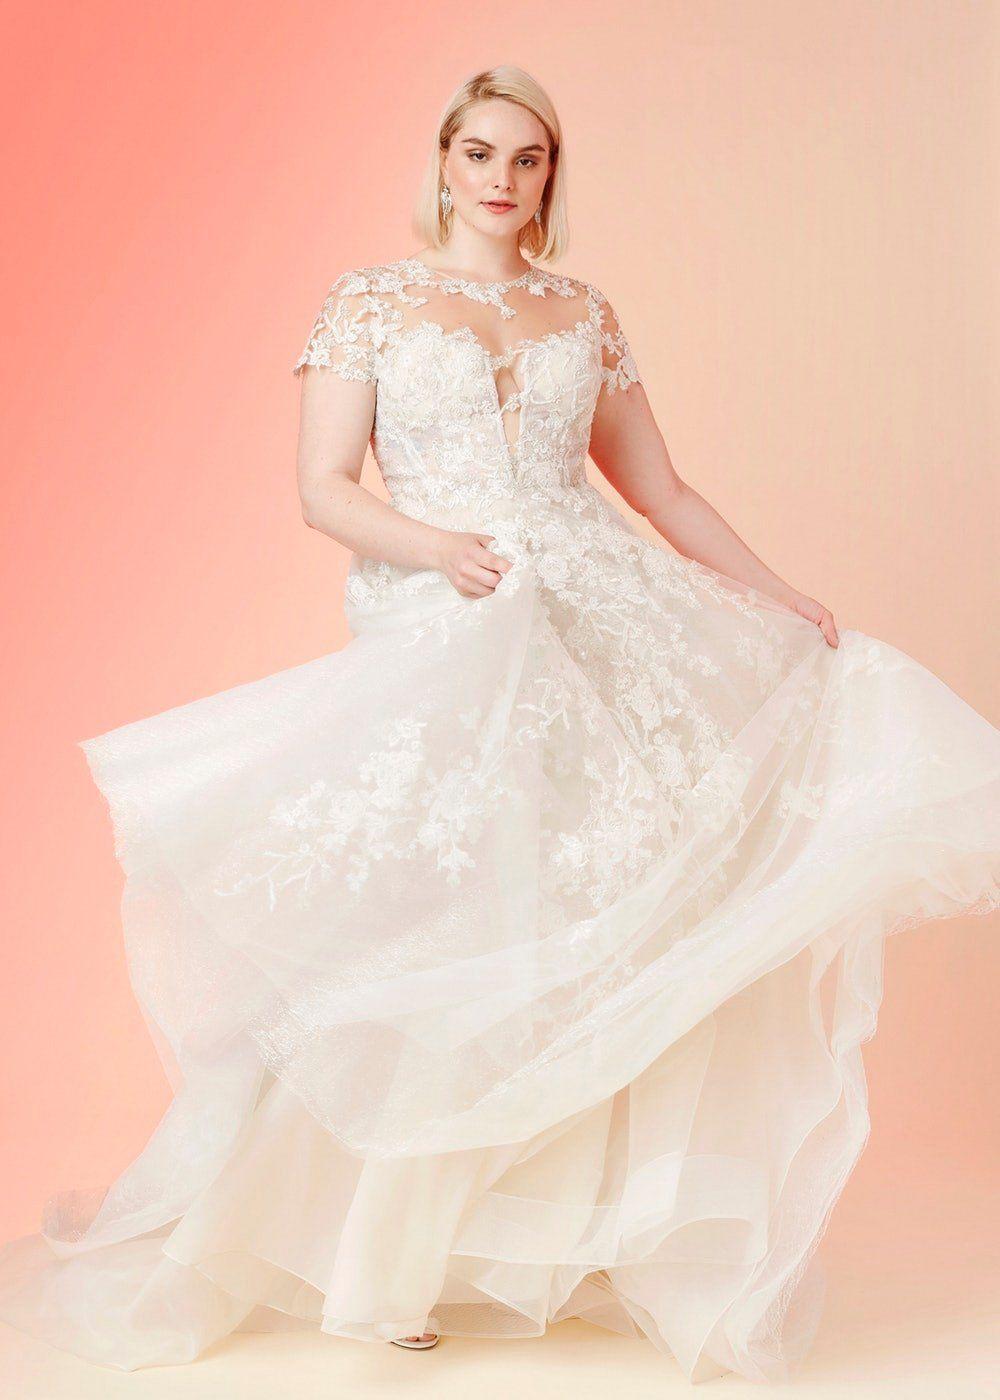 plus size wedding dresses under 20 off 20   medpharmres.com